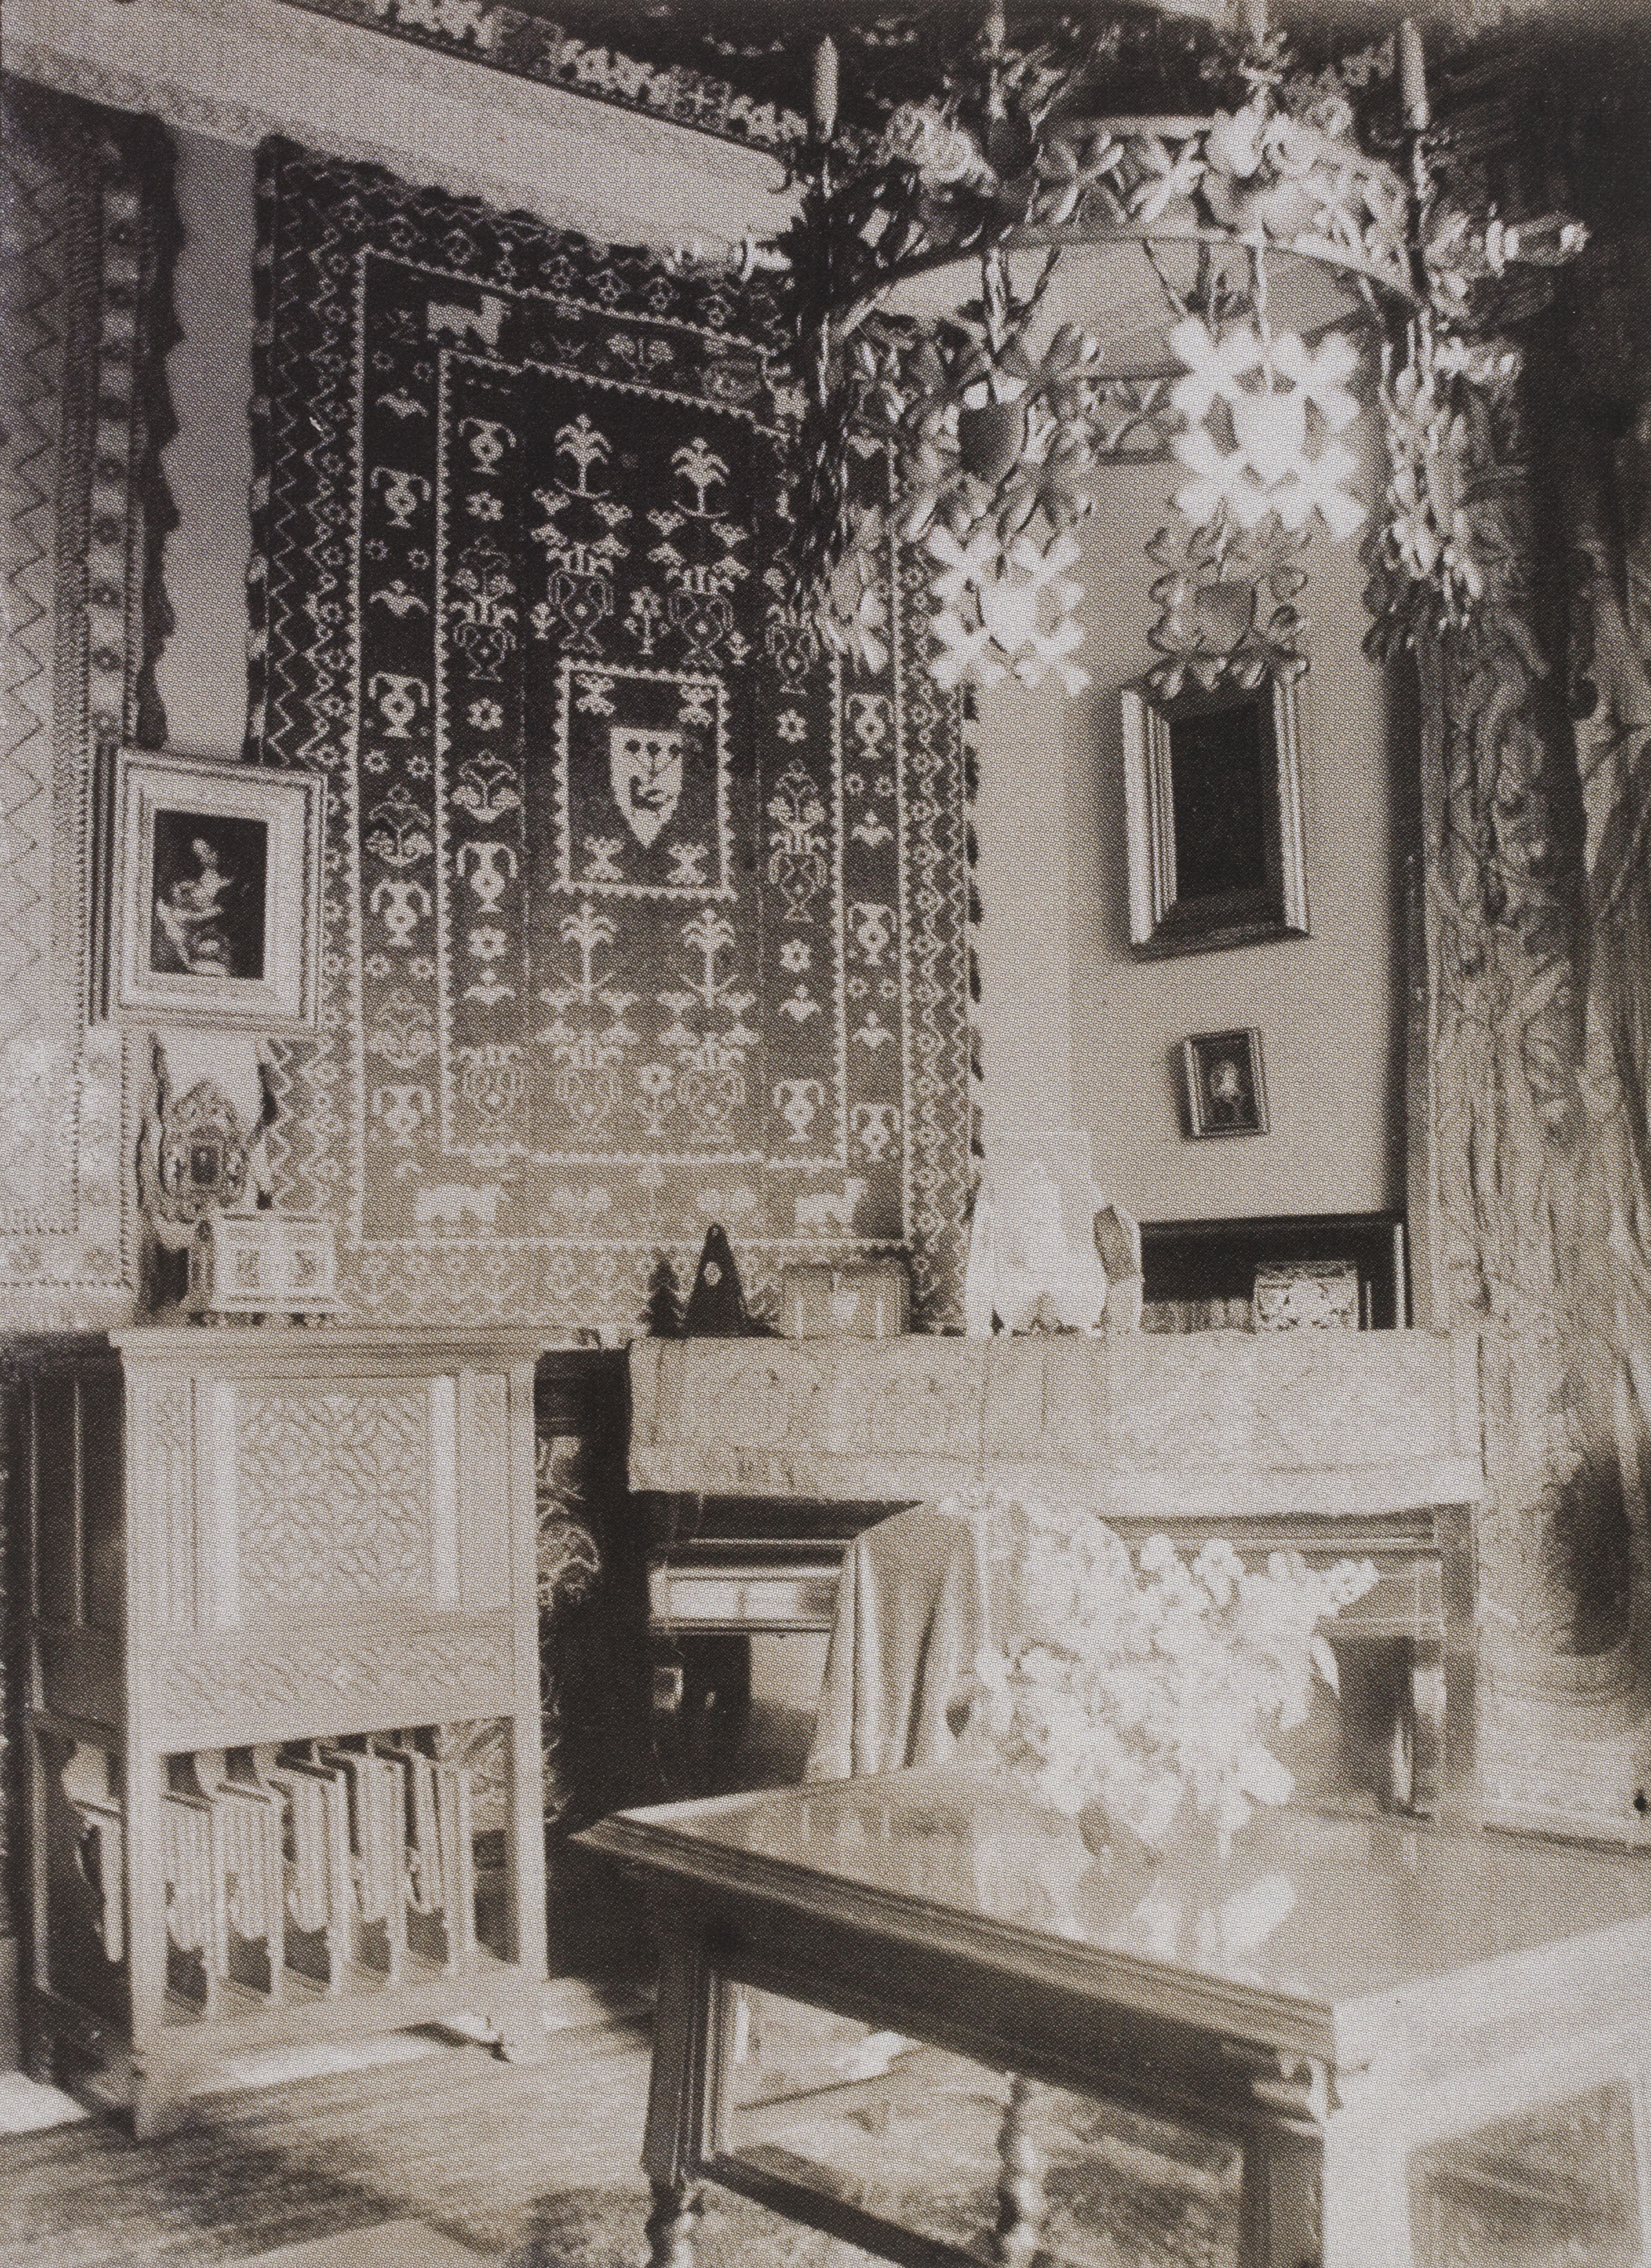 Casa Amatller: Music room, 1901